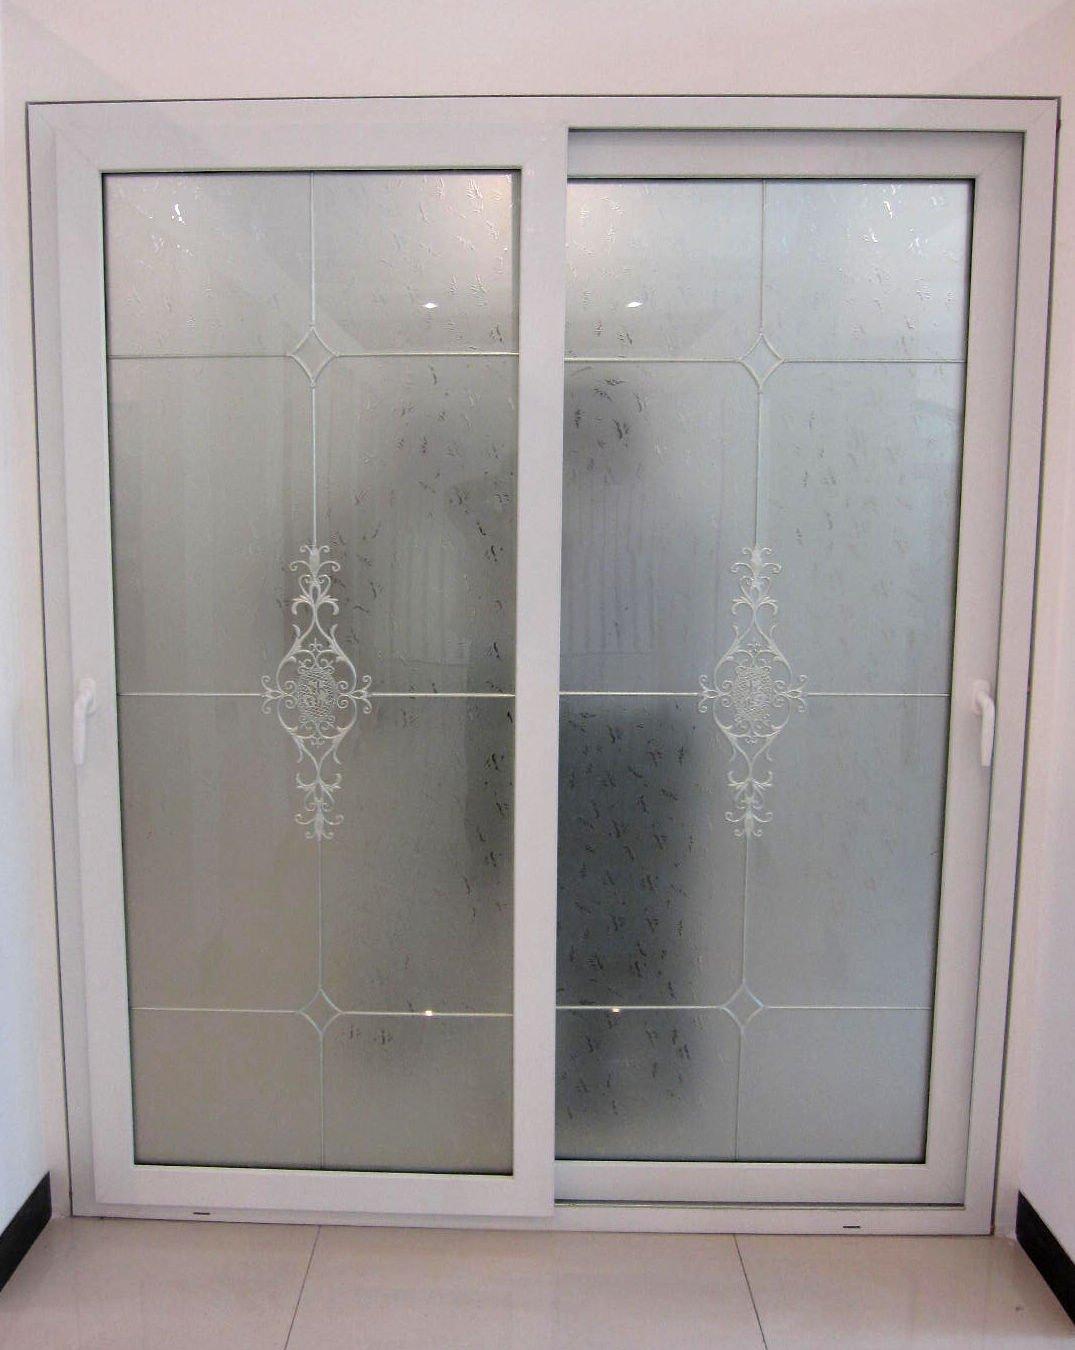 Puertas ventanas y closets de aluminio pelautscom tattoo - Puerta corredera de aluminio ...